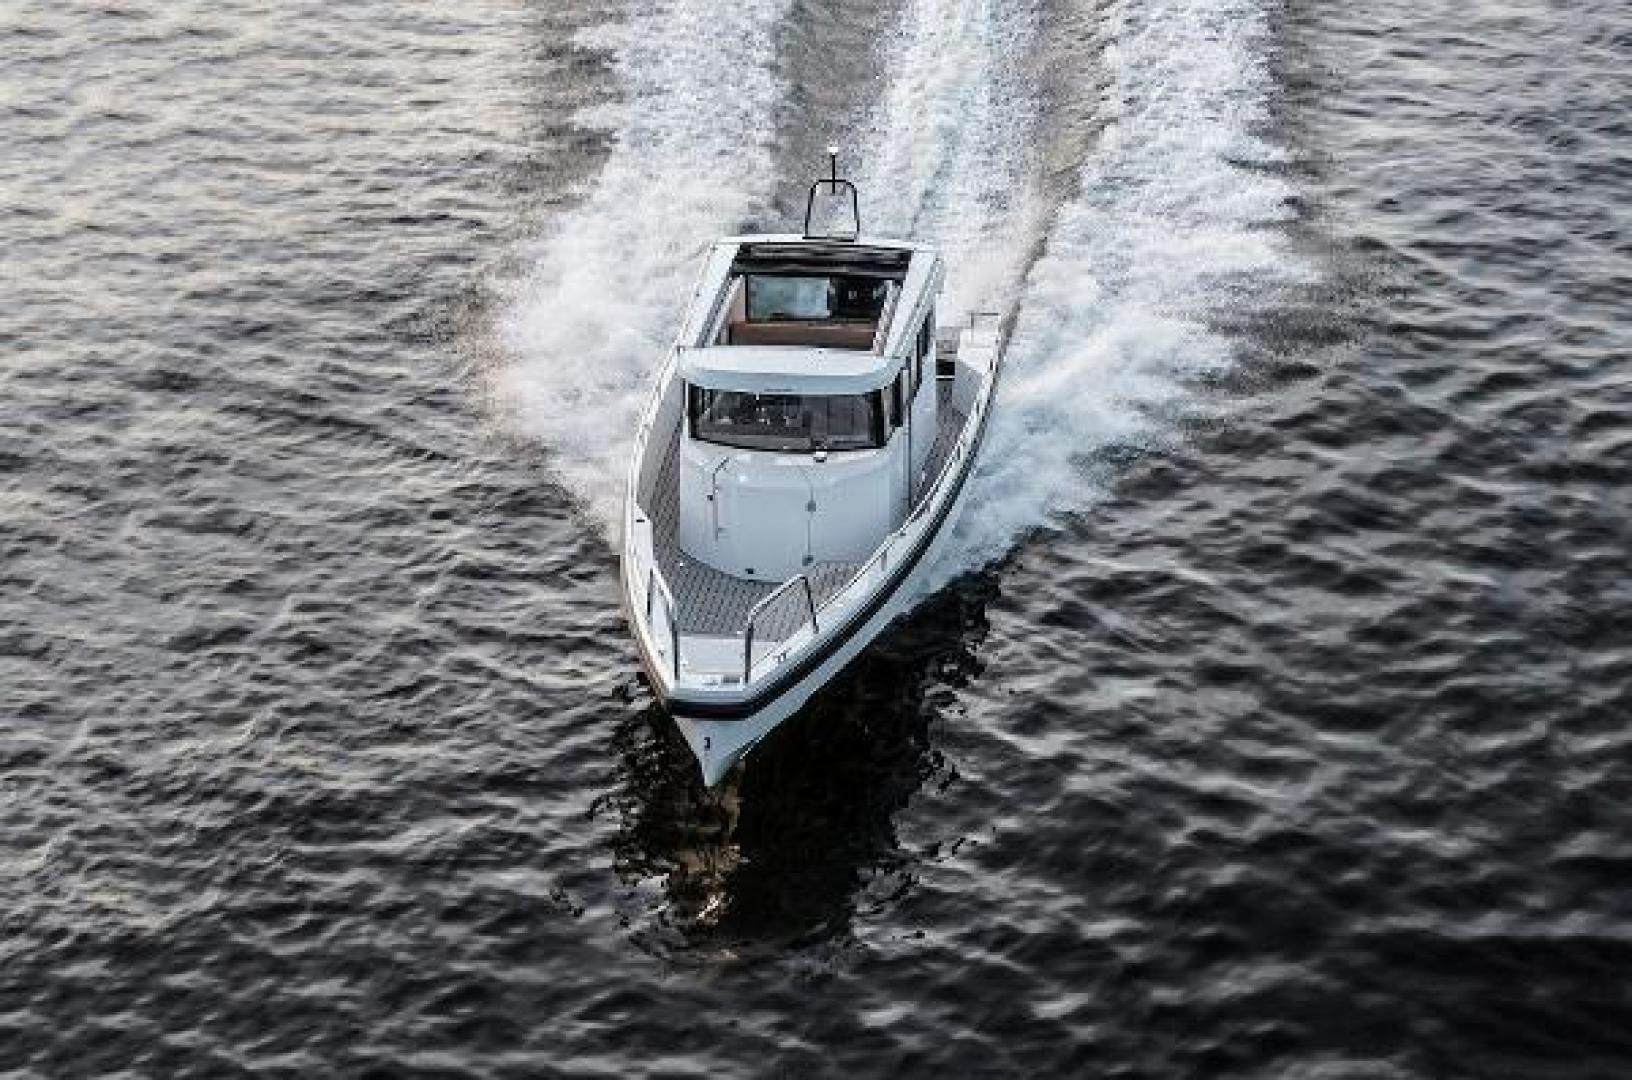 Axopar-28 CABIN 2020-Axopar 28 CABIN Fort Lauderdale-Florida-United States-1531312 | Thumbnail